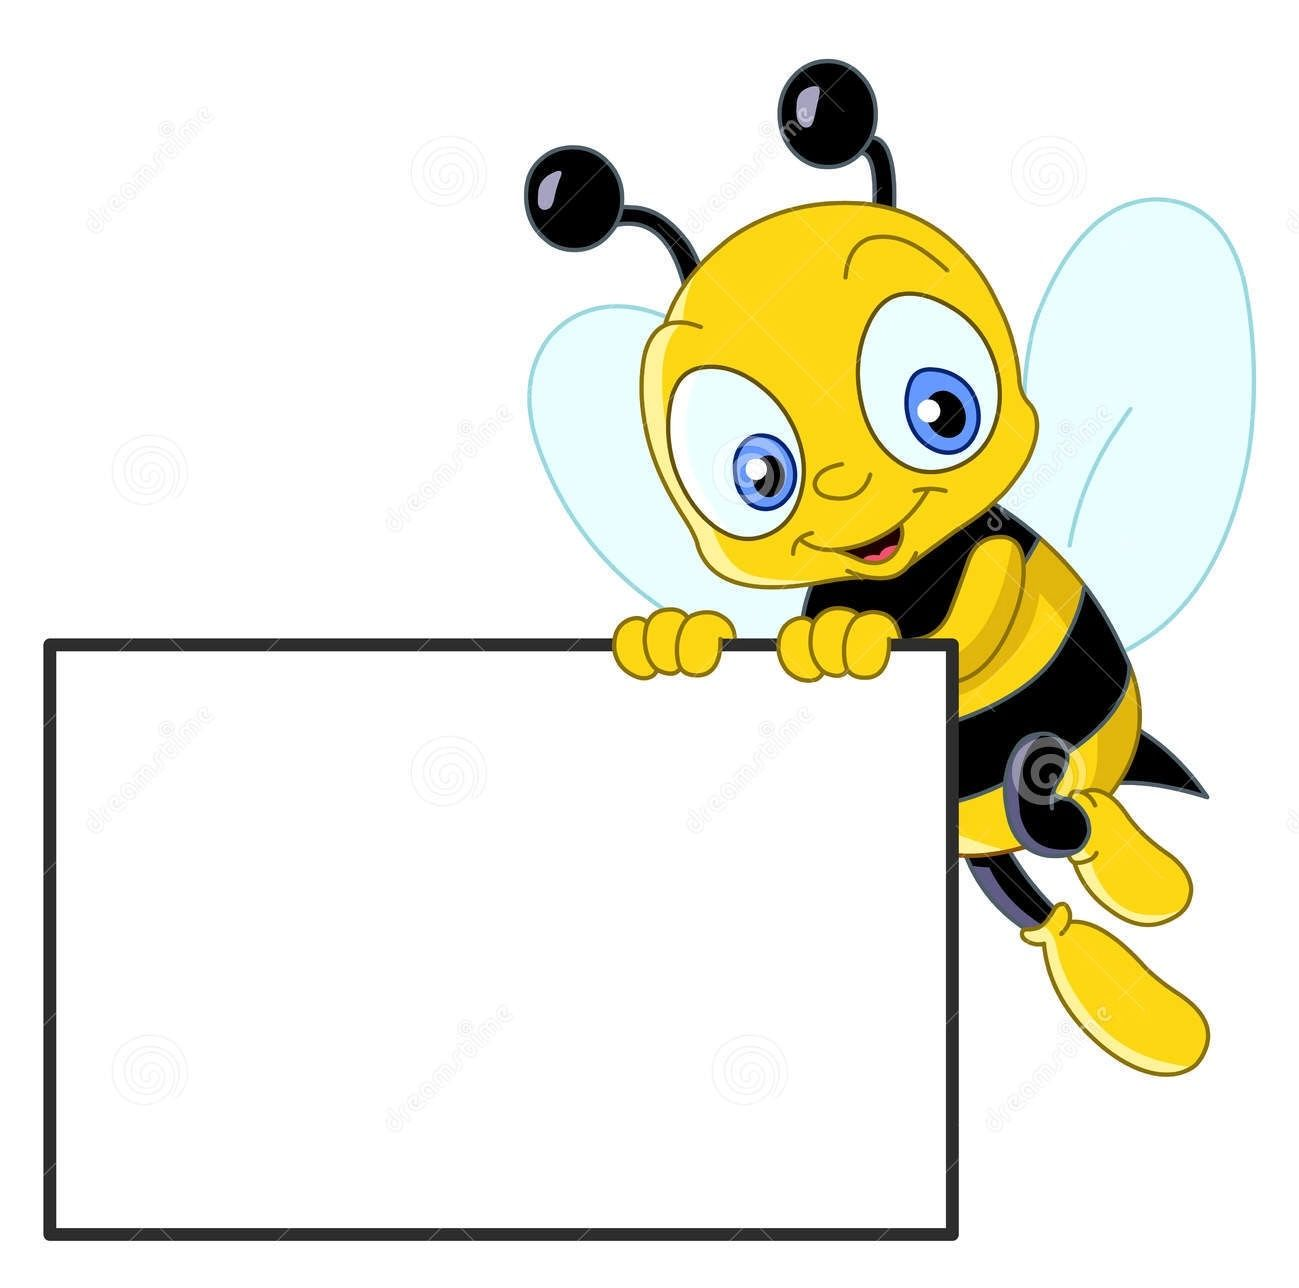 dreamstime com bee frame pinterest bees rh pinterest com